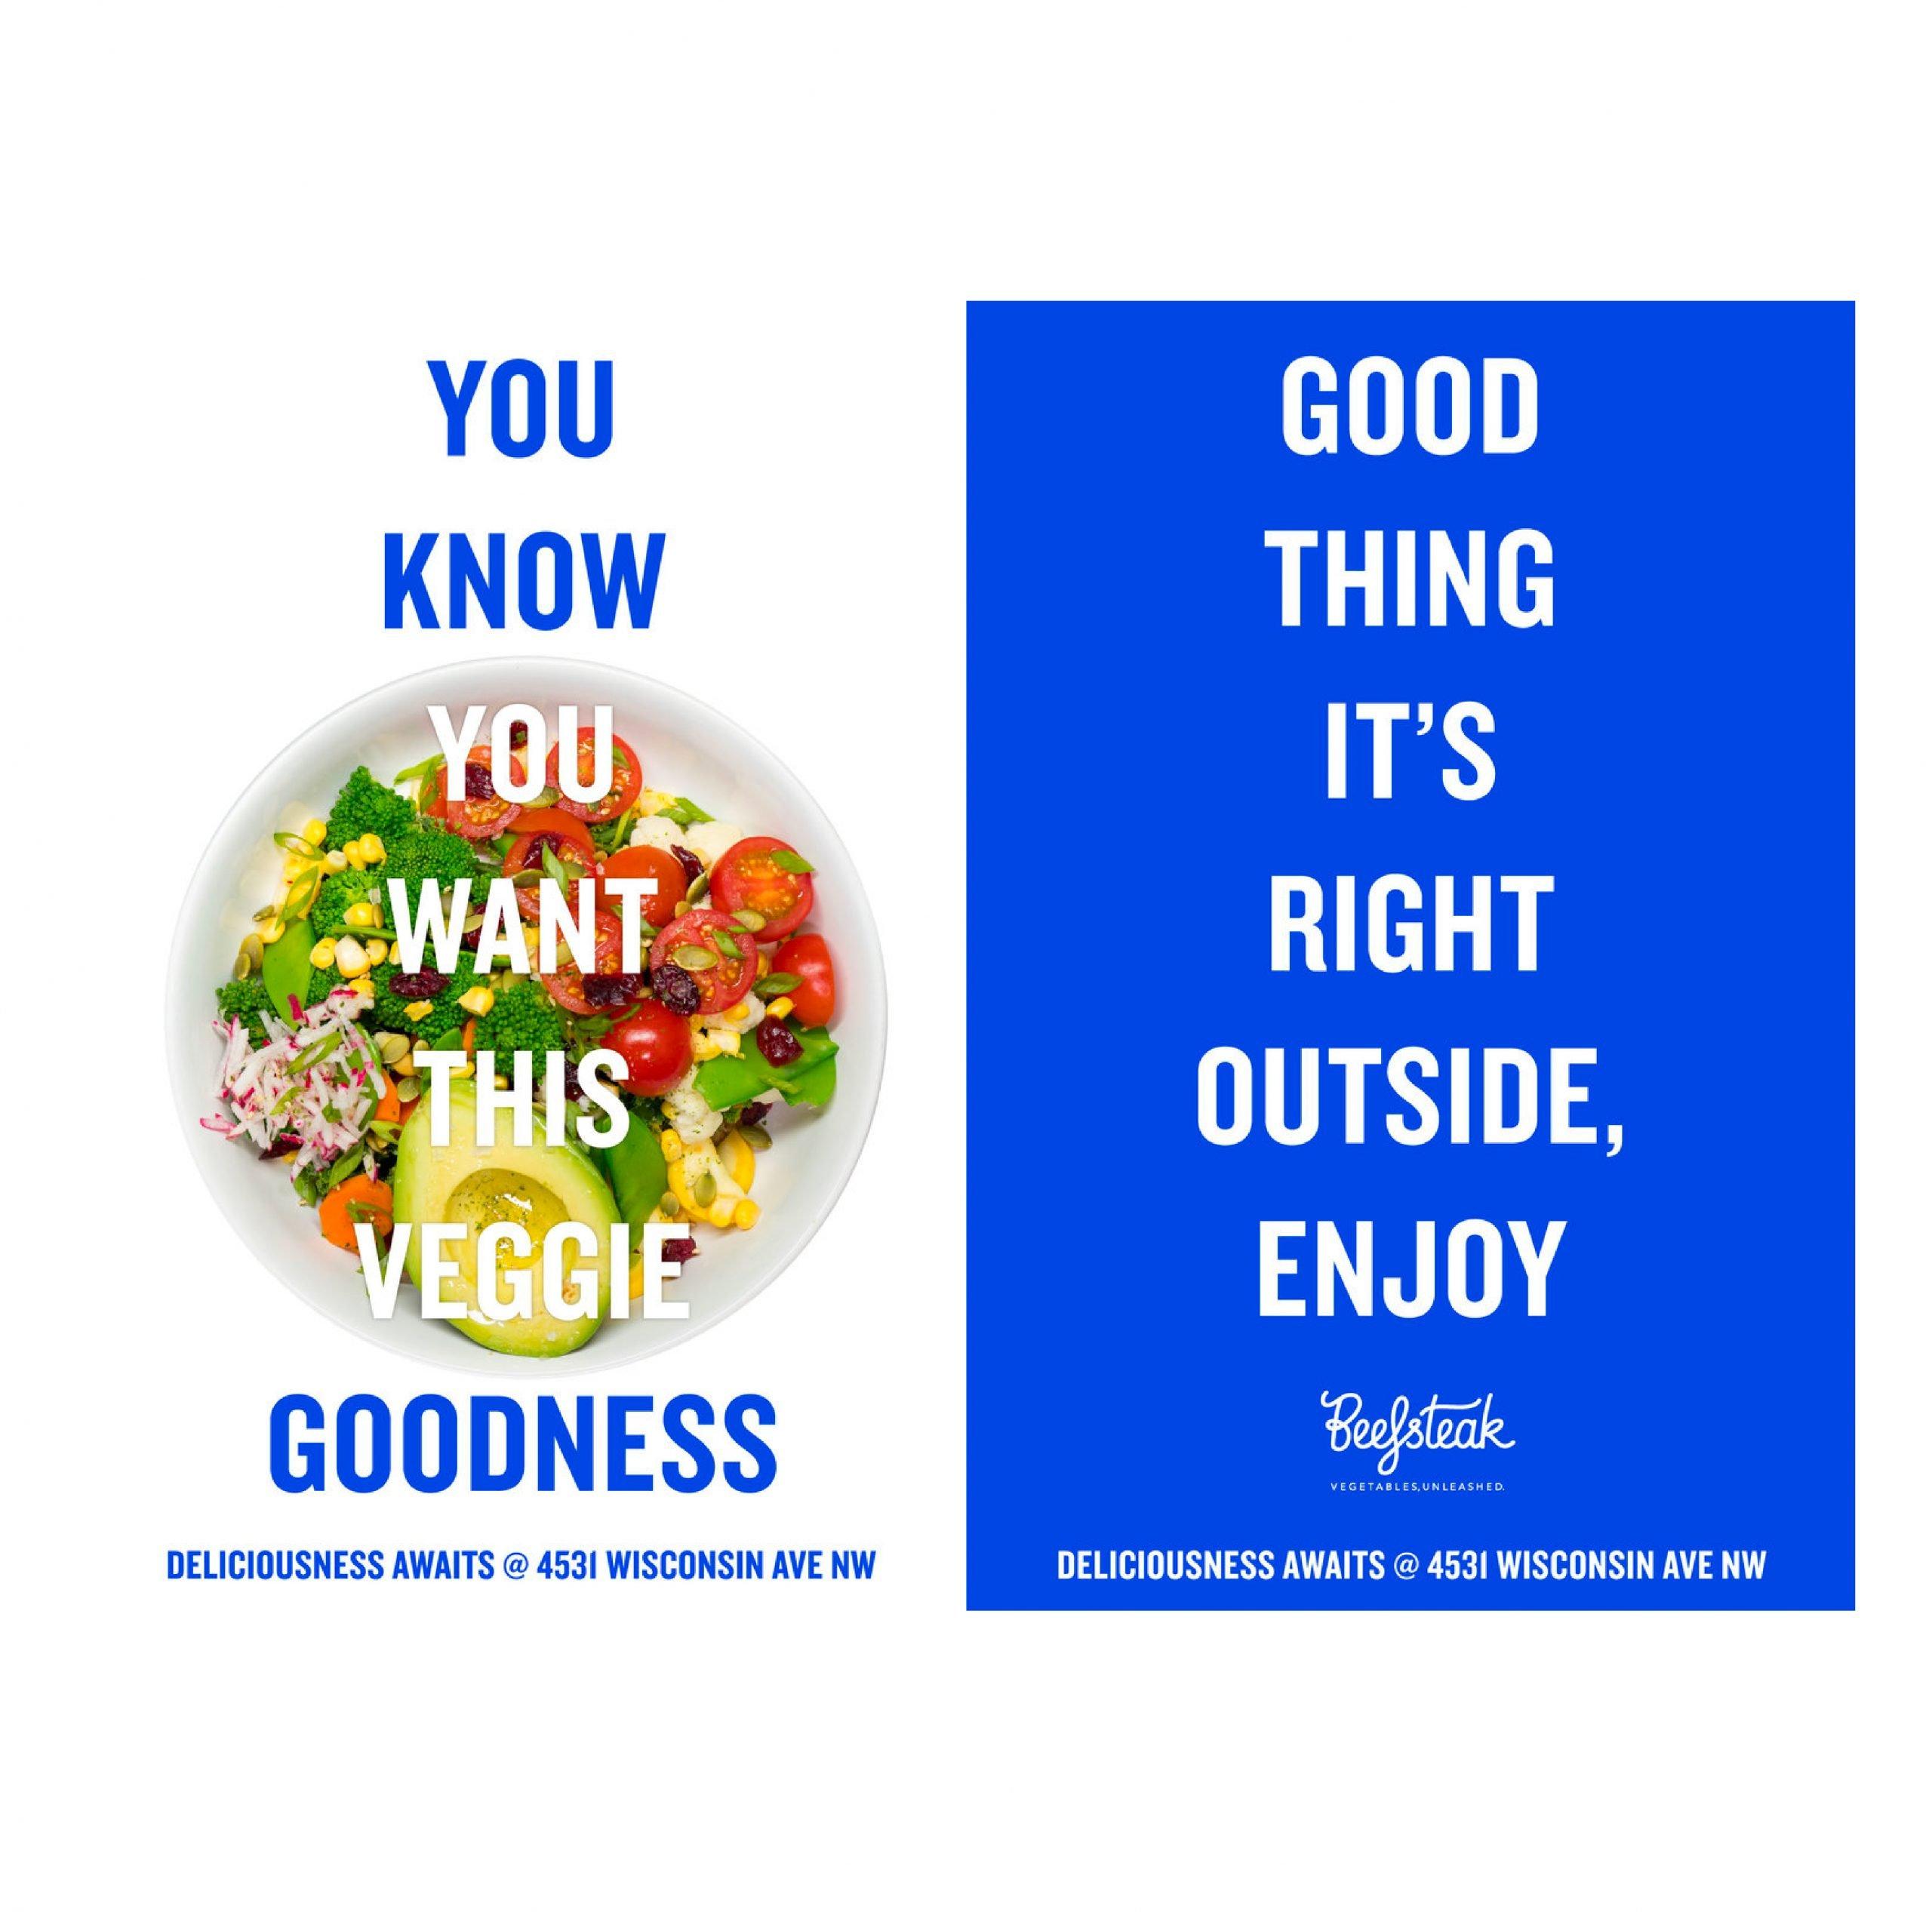 Beefsteak restaurants marketing materials created by our brand design agency